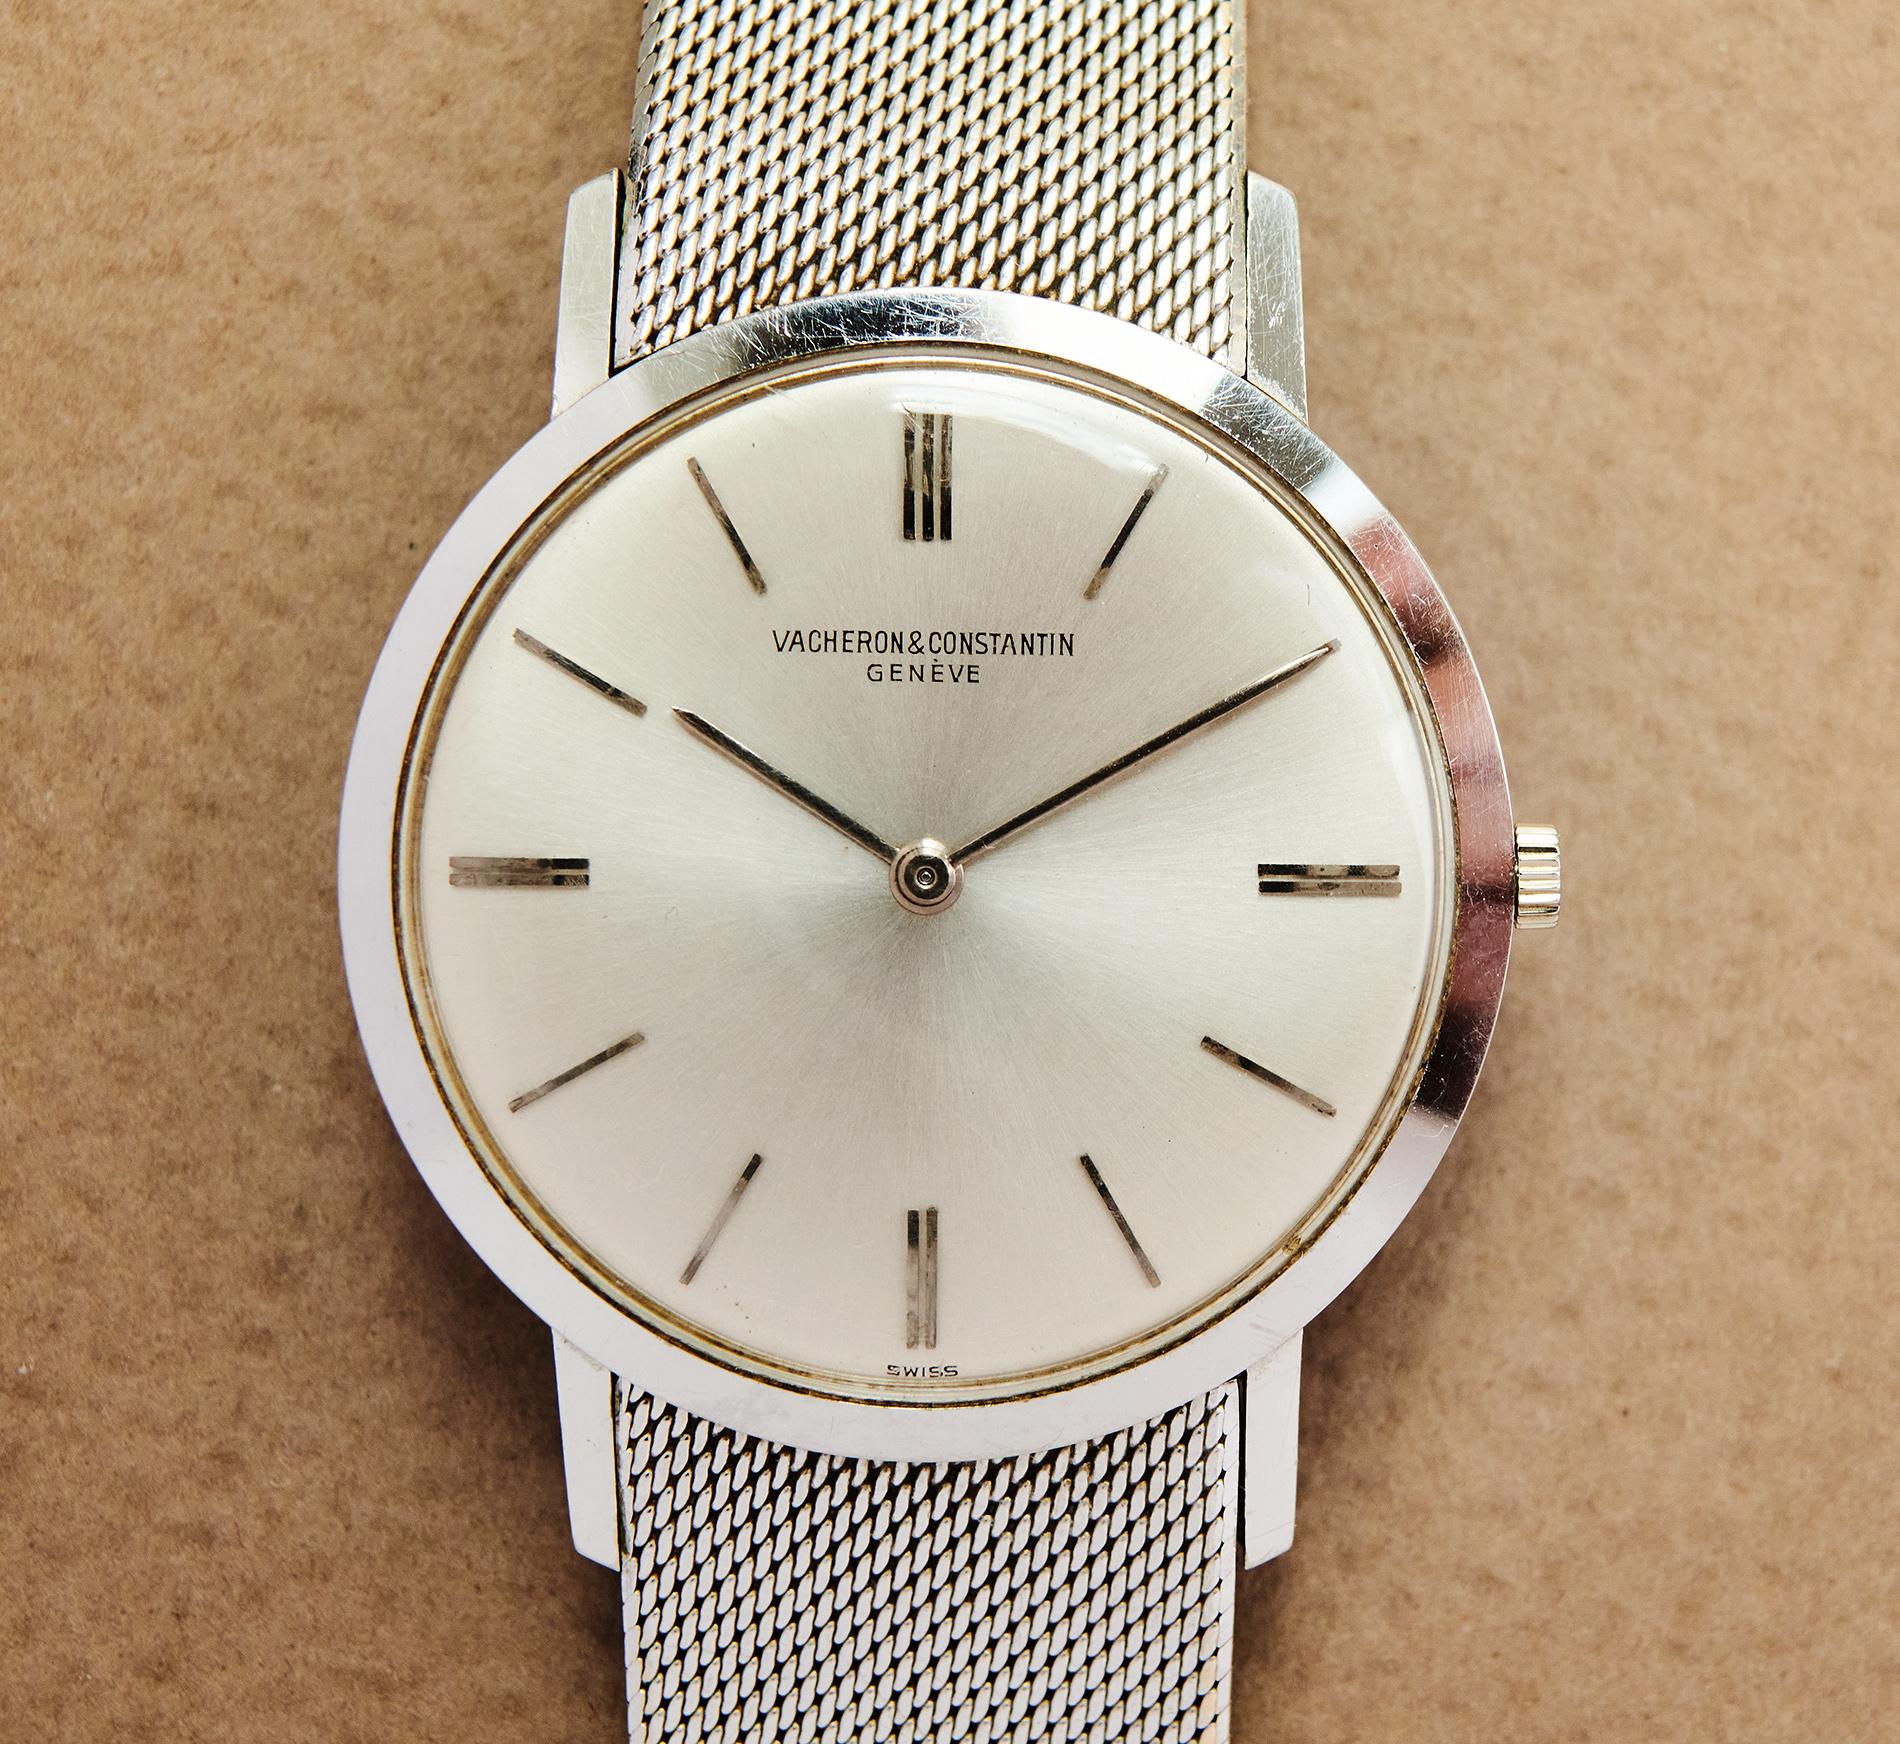 Vacheron Constantin 18k dresswatch